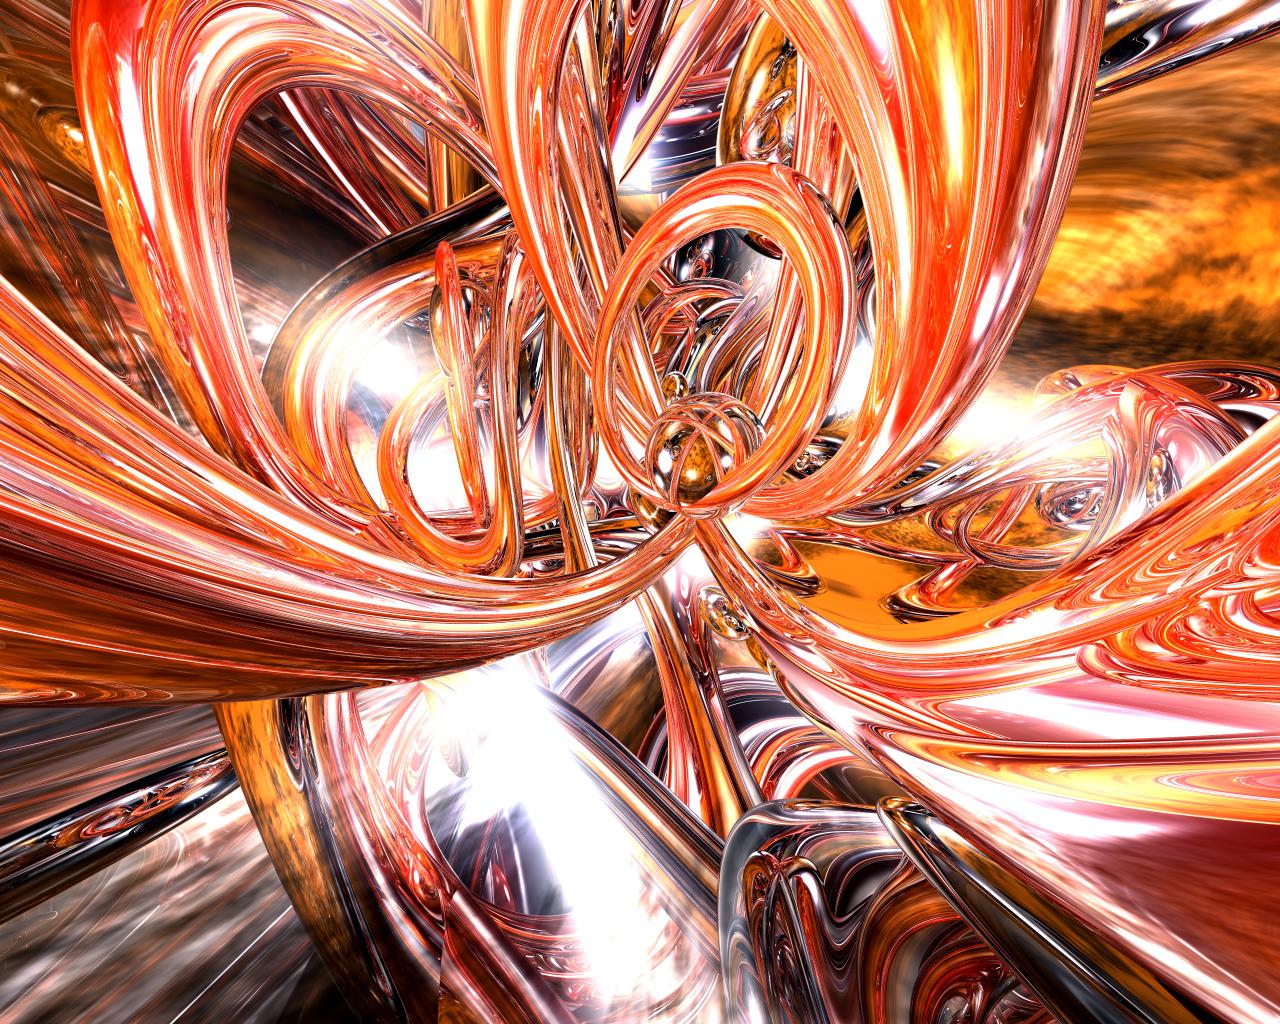 Unityopportunity: 3D Abstract Desktop Wallpapers